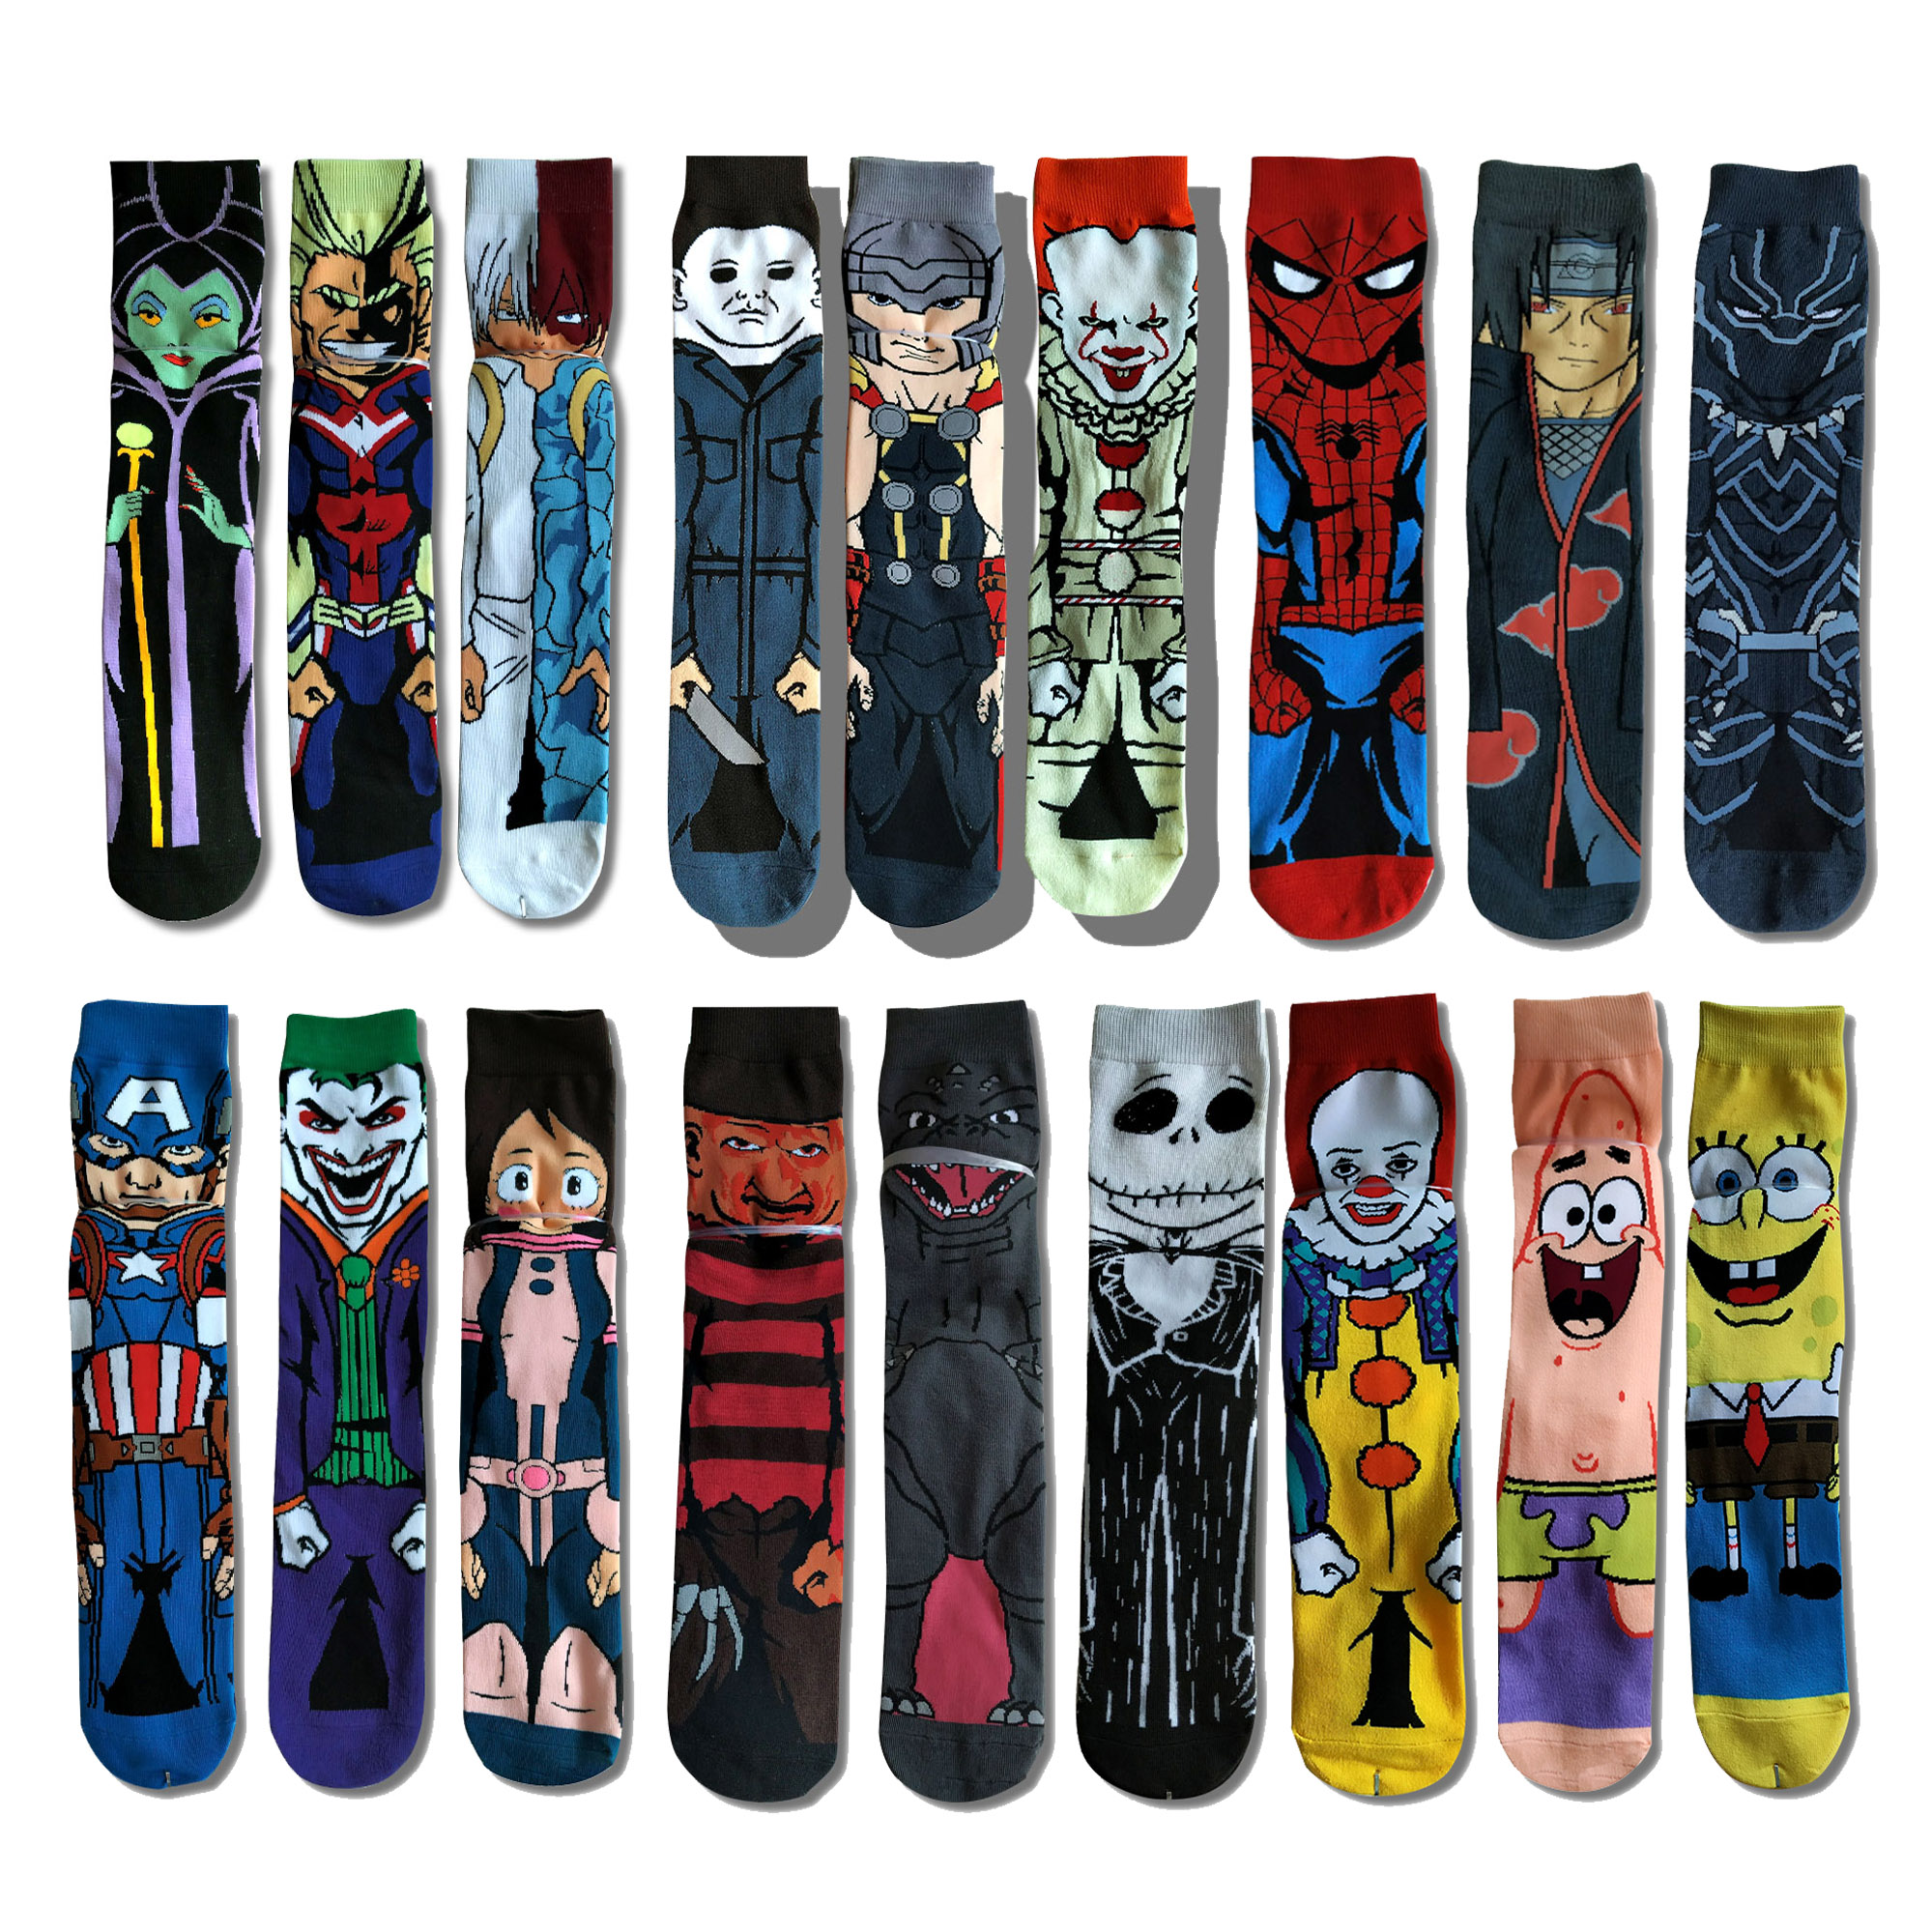 Casual Hip Hop Anime Cartoon Socks Men Fashion Funny Superhero Spiderman Men's Socks Dress Cotton Warm Marvel Dress Socks